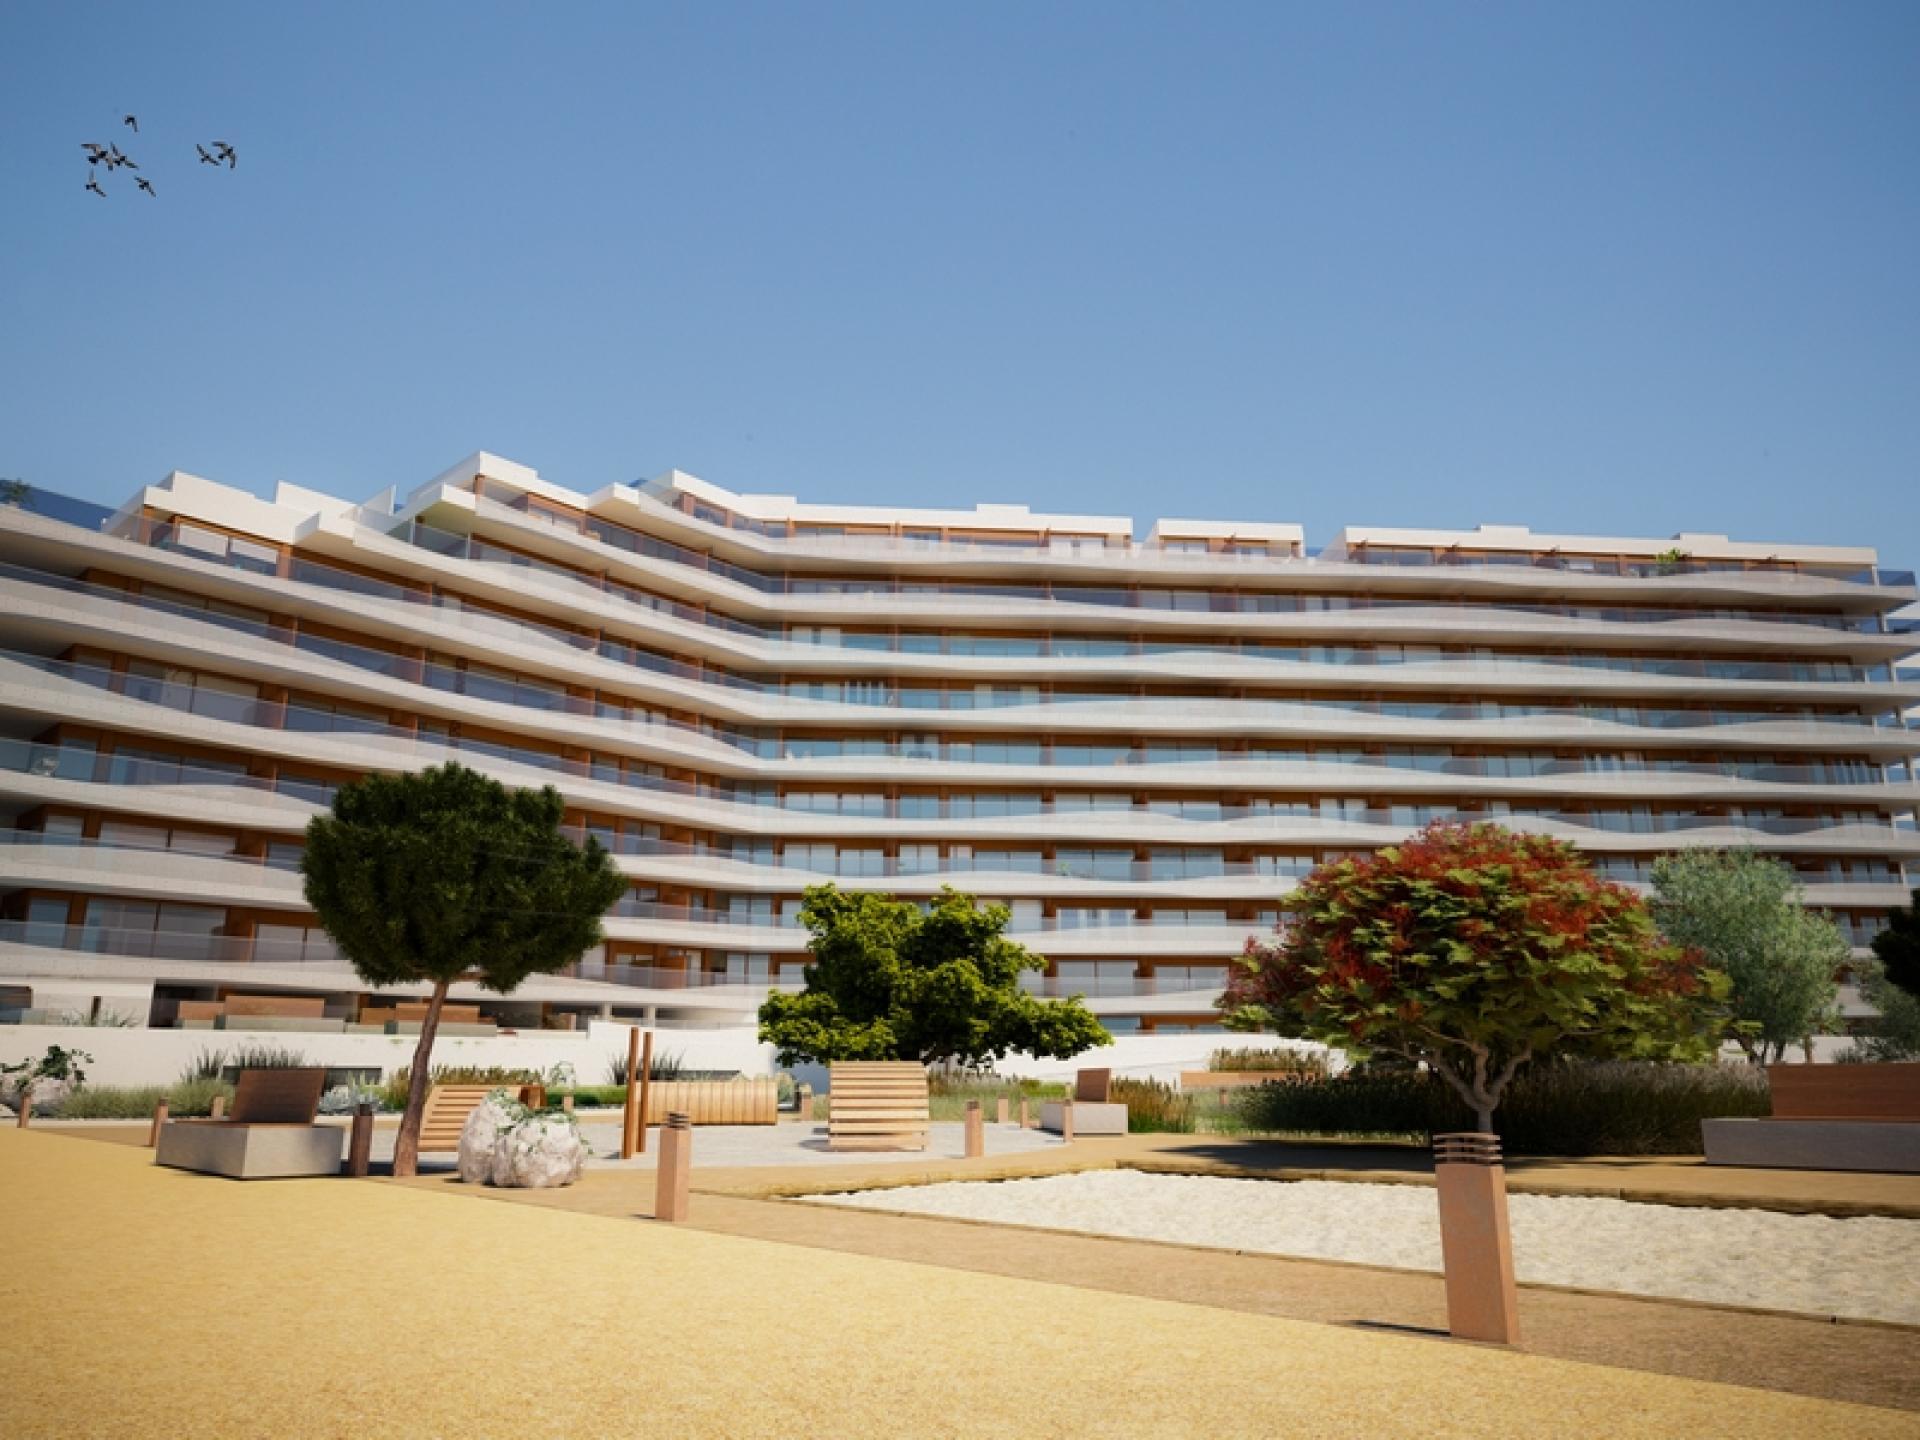 Los Flamencos - La Manga Costa Cálida, Murcia